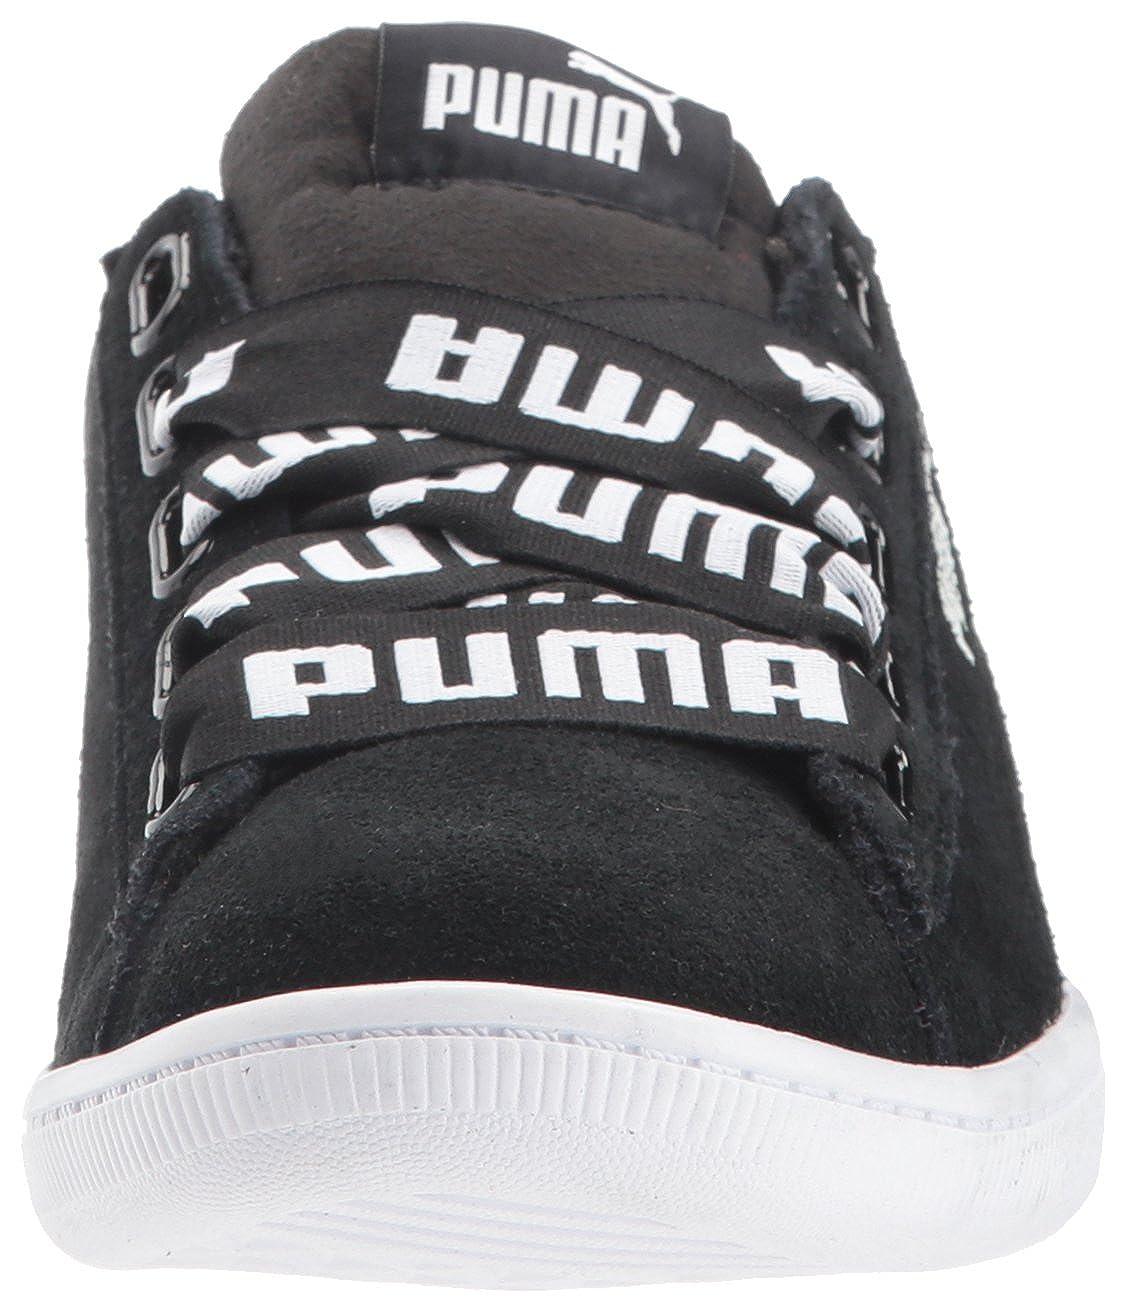 PUMA Woherren Vikky Ribbon Bold Turnschuhe, schwarz schwarz schwarz schwarz, 9 M US dcf547